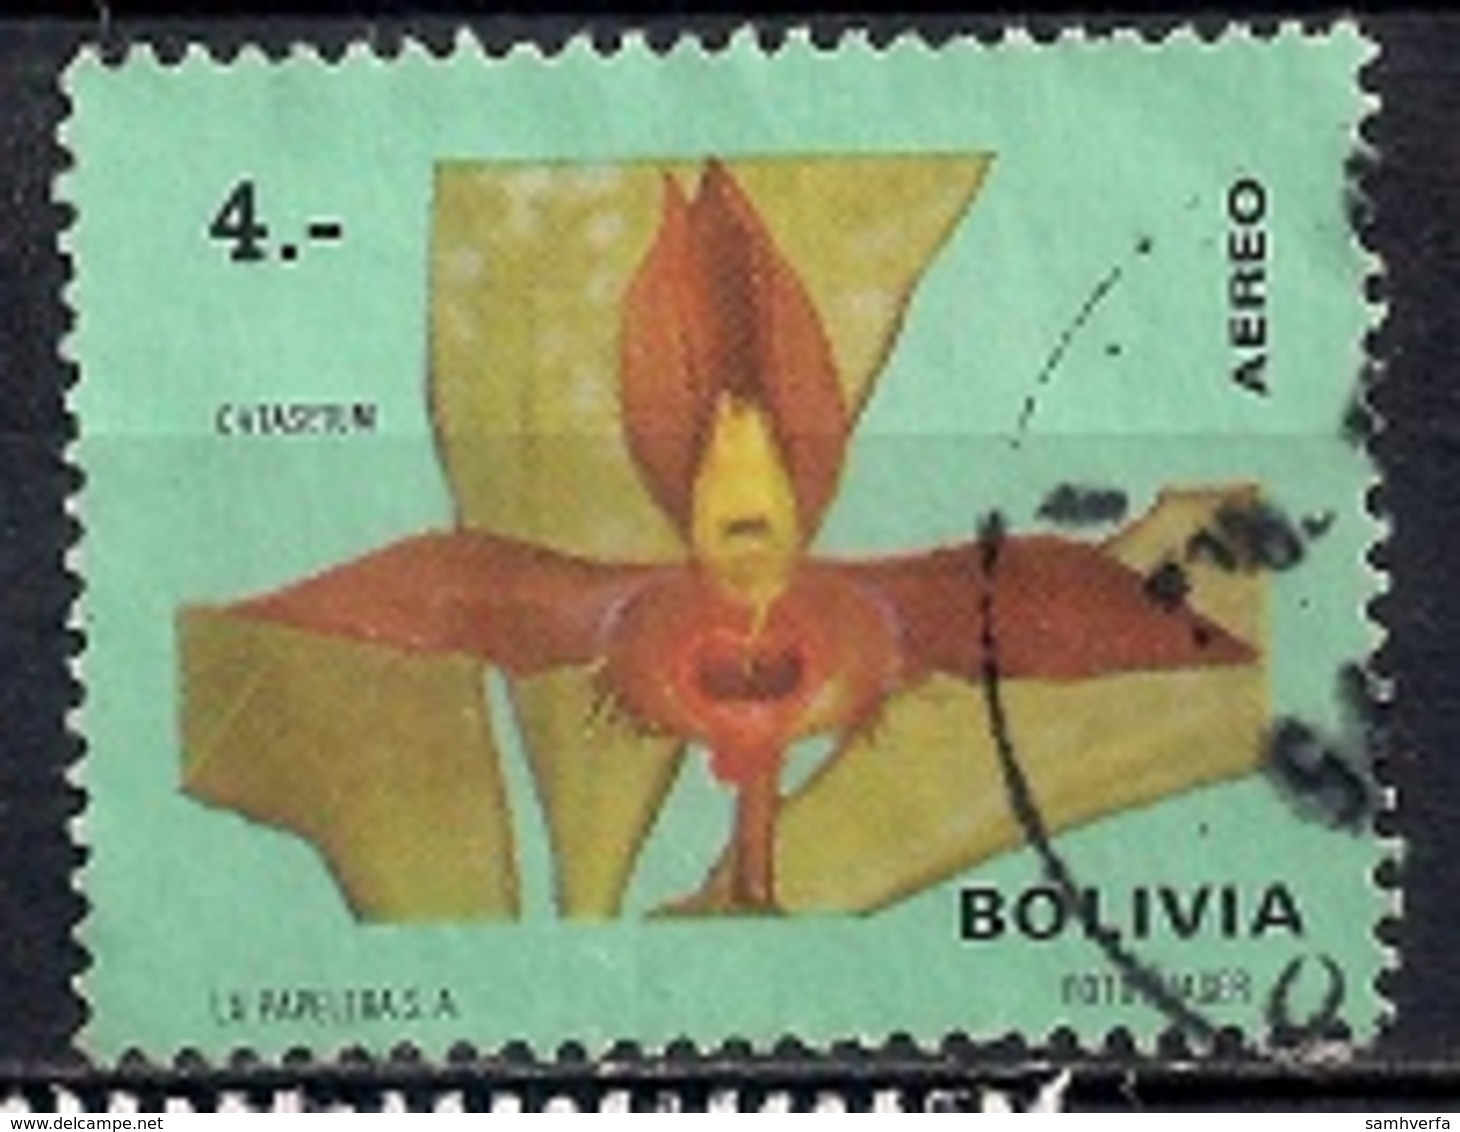 Bolivia 1974 - Airmail - Orchids - Bolivia